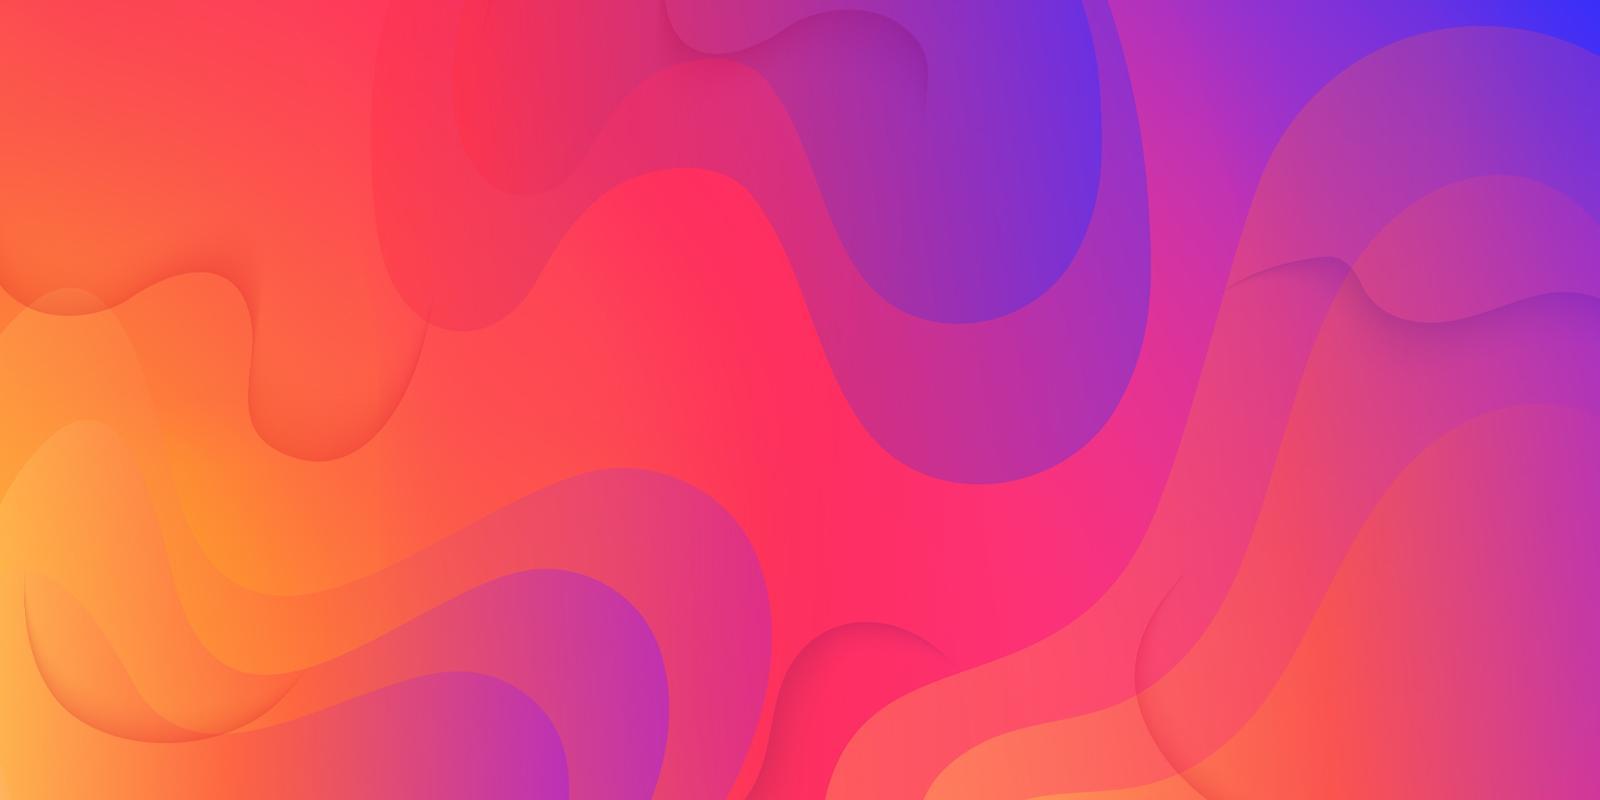 discover download free vector art  [ 1600 x 800 Pixel ]